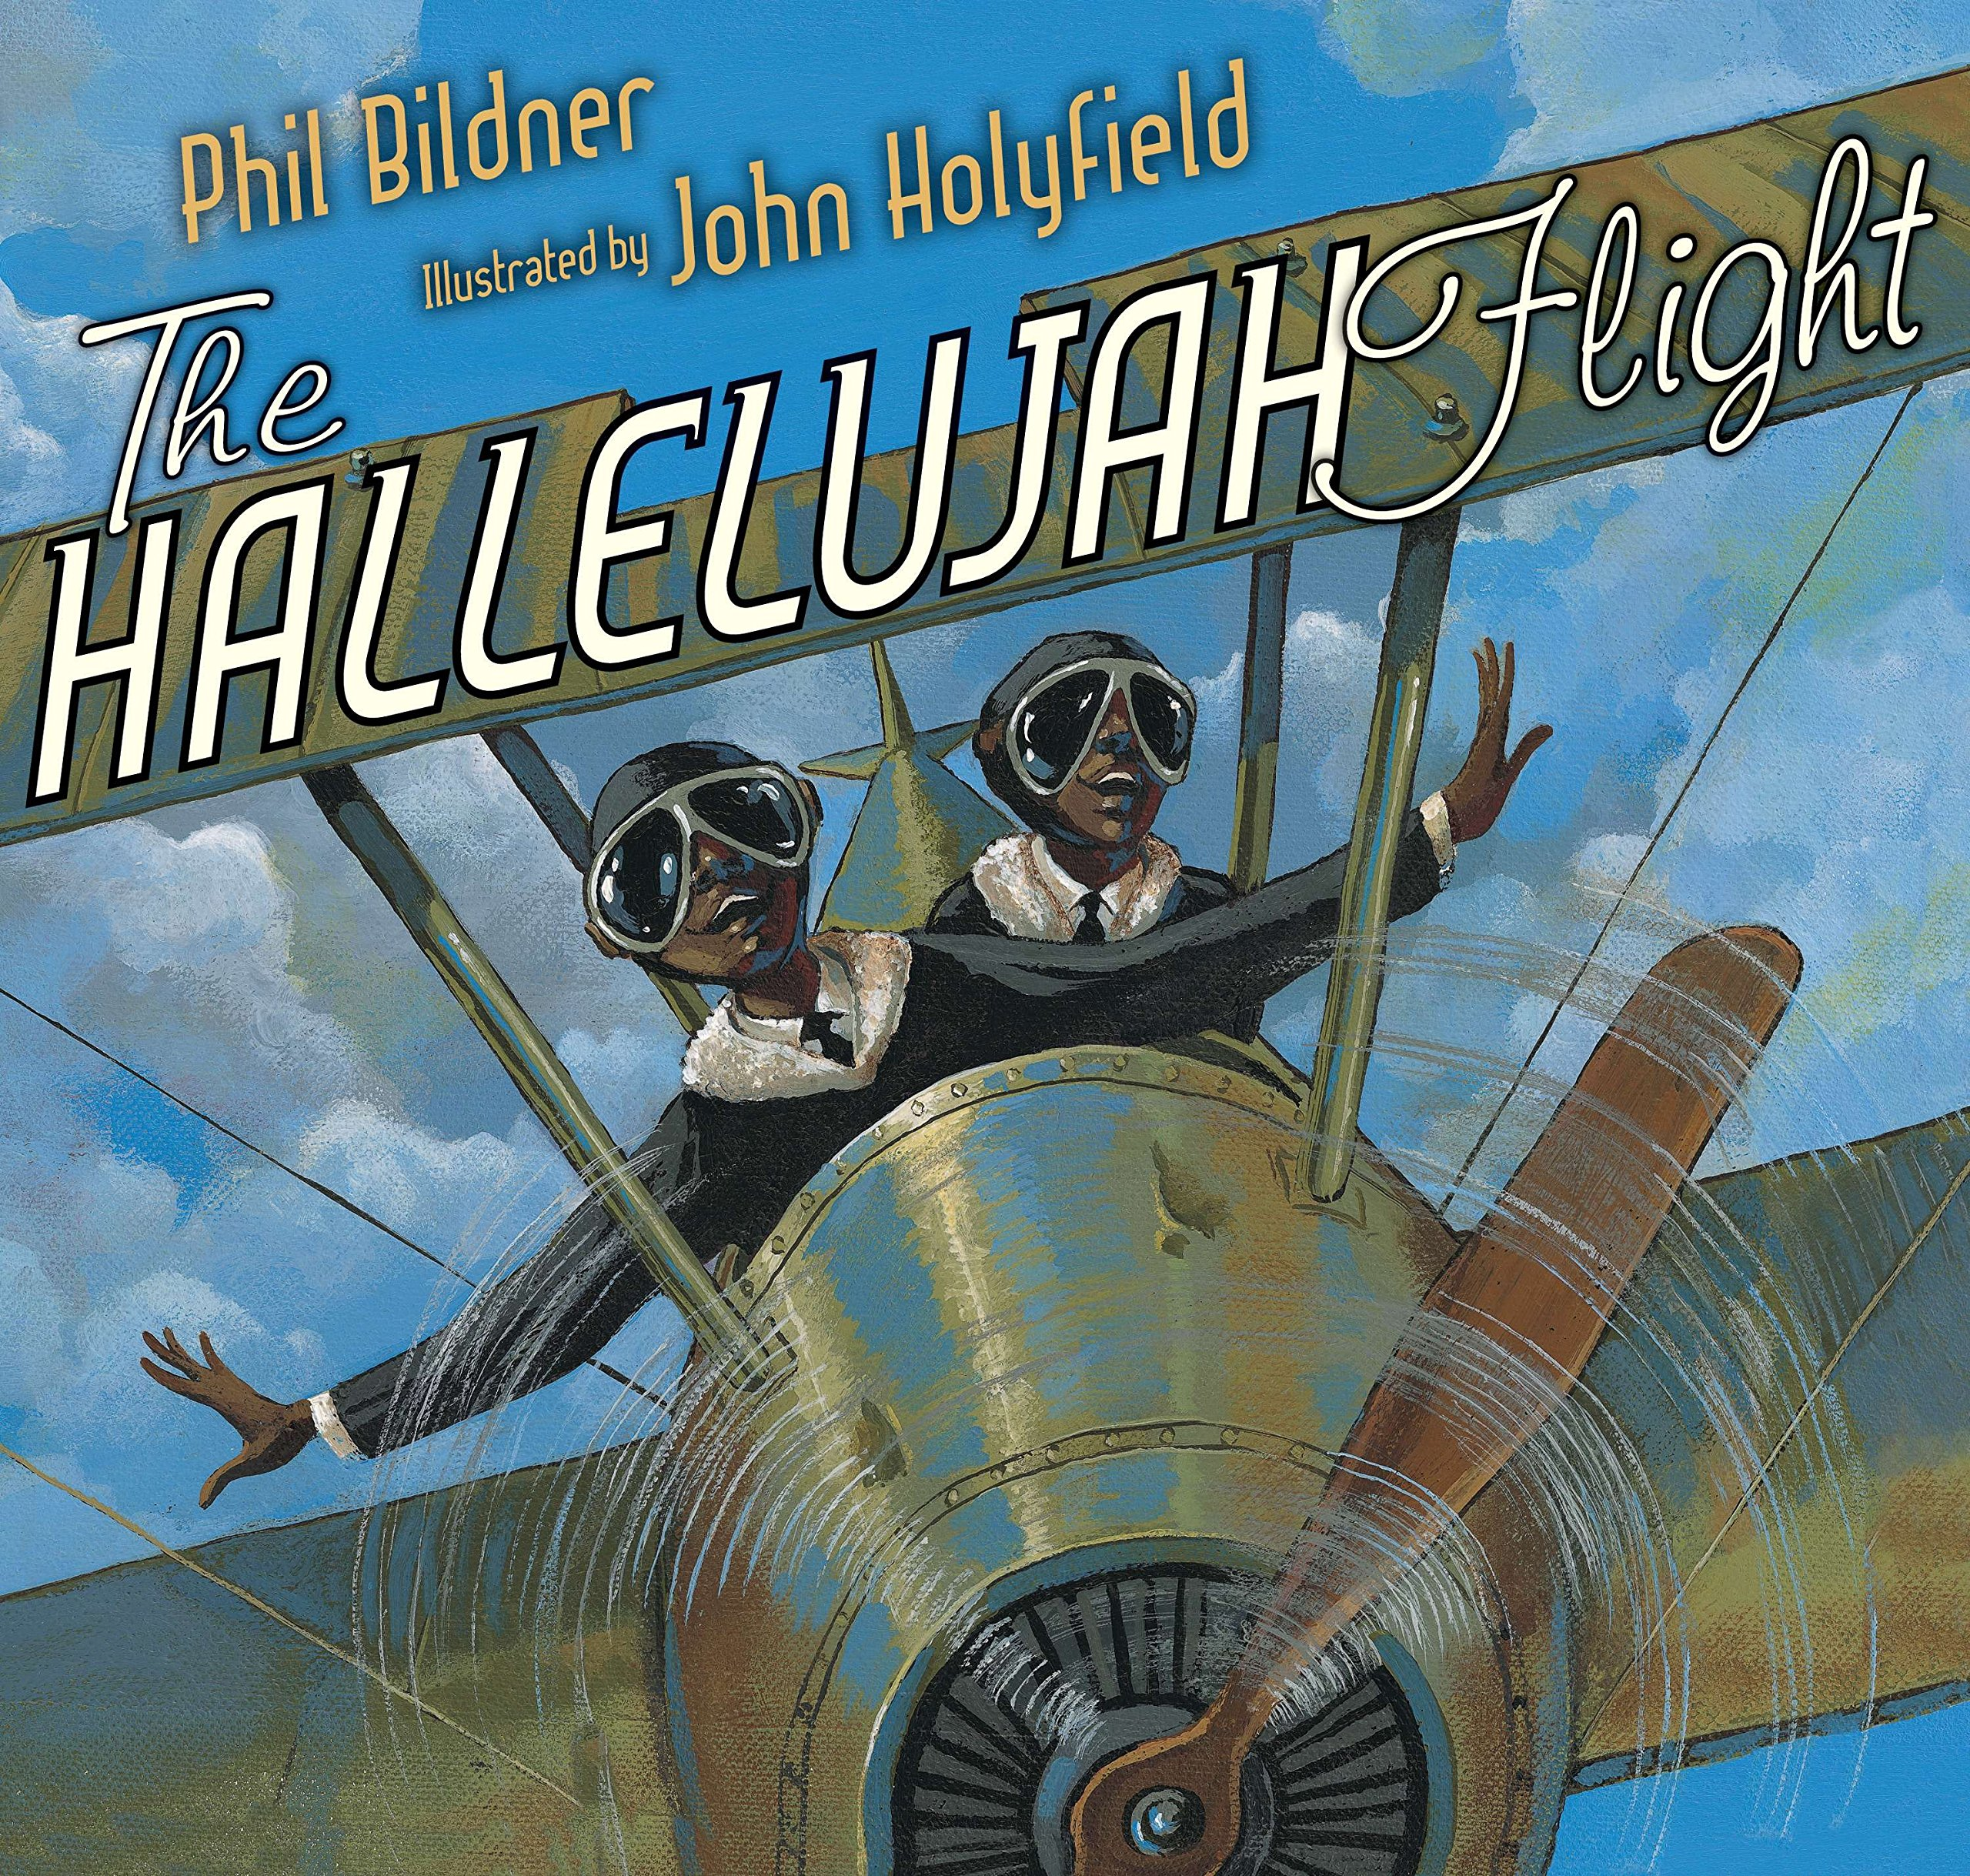 The Hallelujah Flight: Amazon co uk: Phil Bildner, John